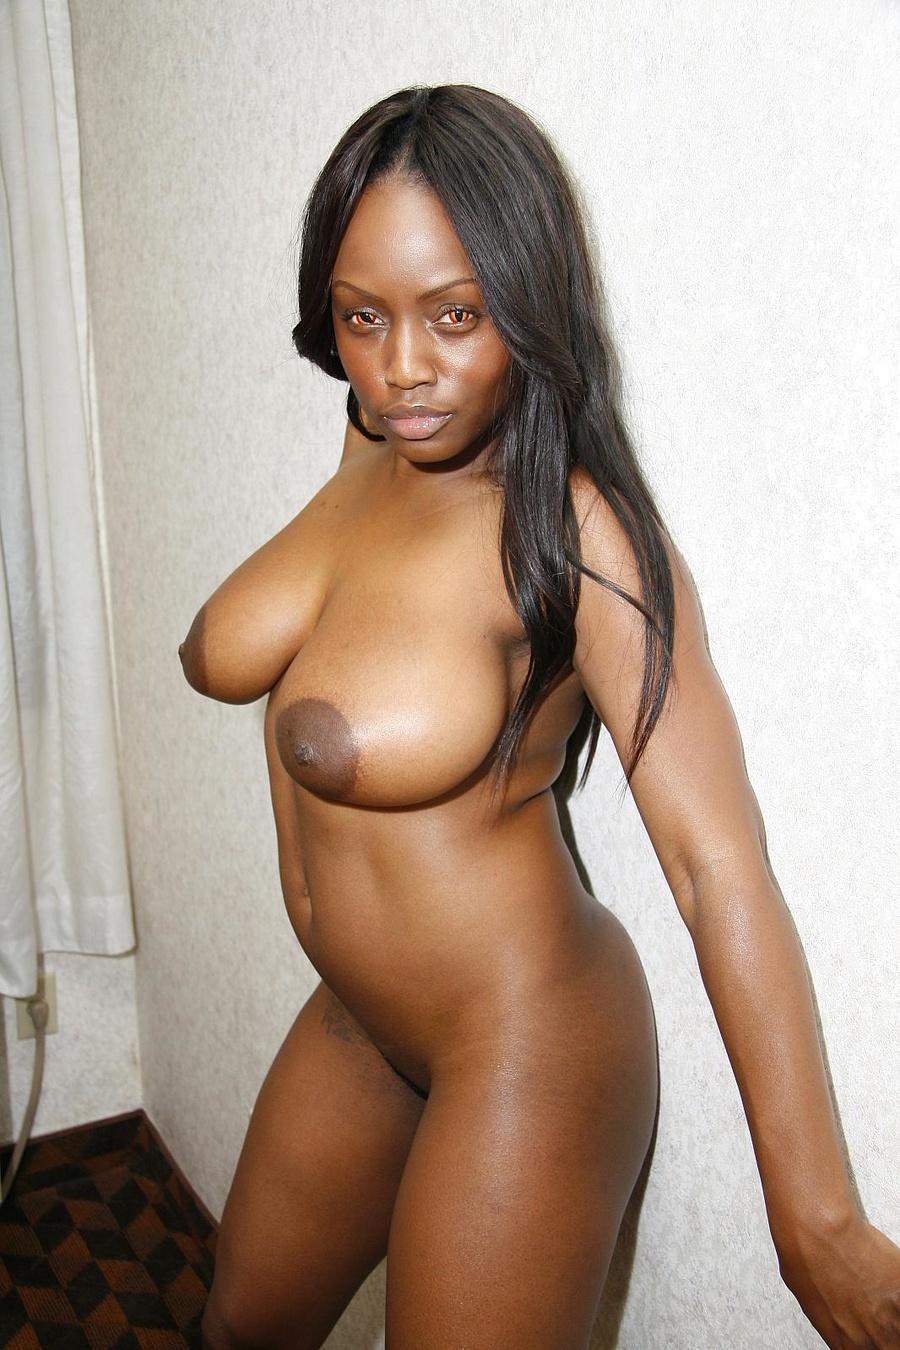 milf undressing xxx videos jpg 422x640